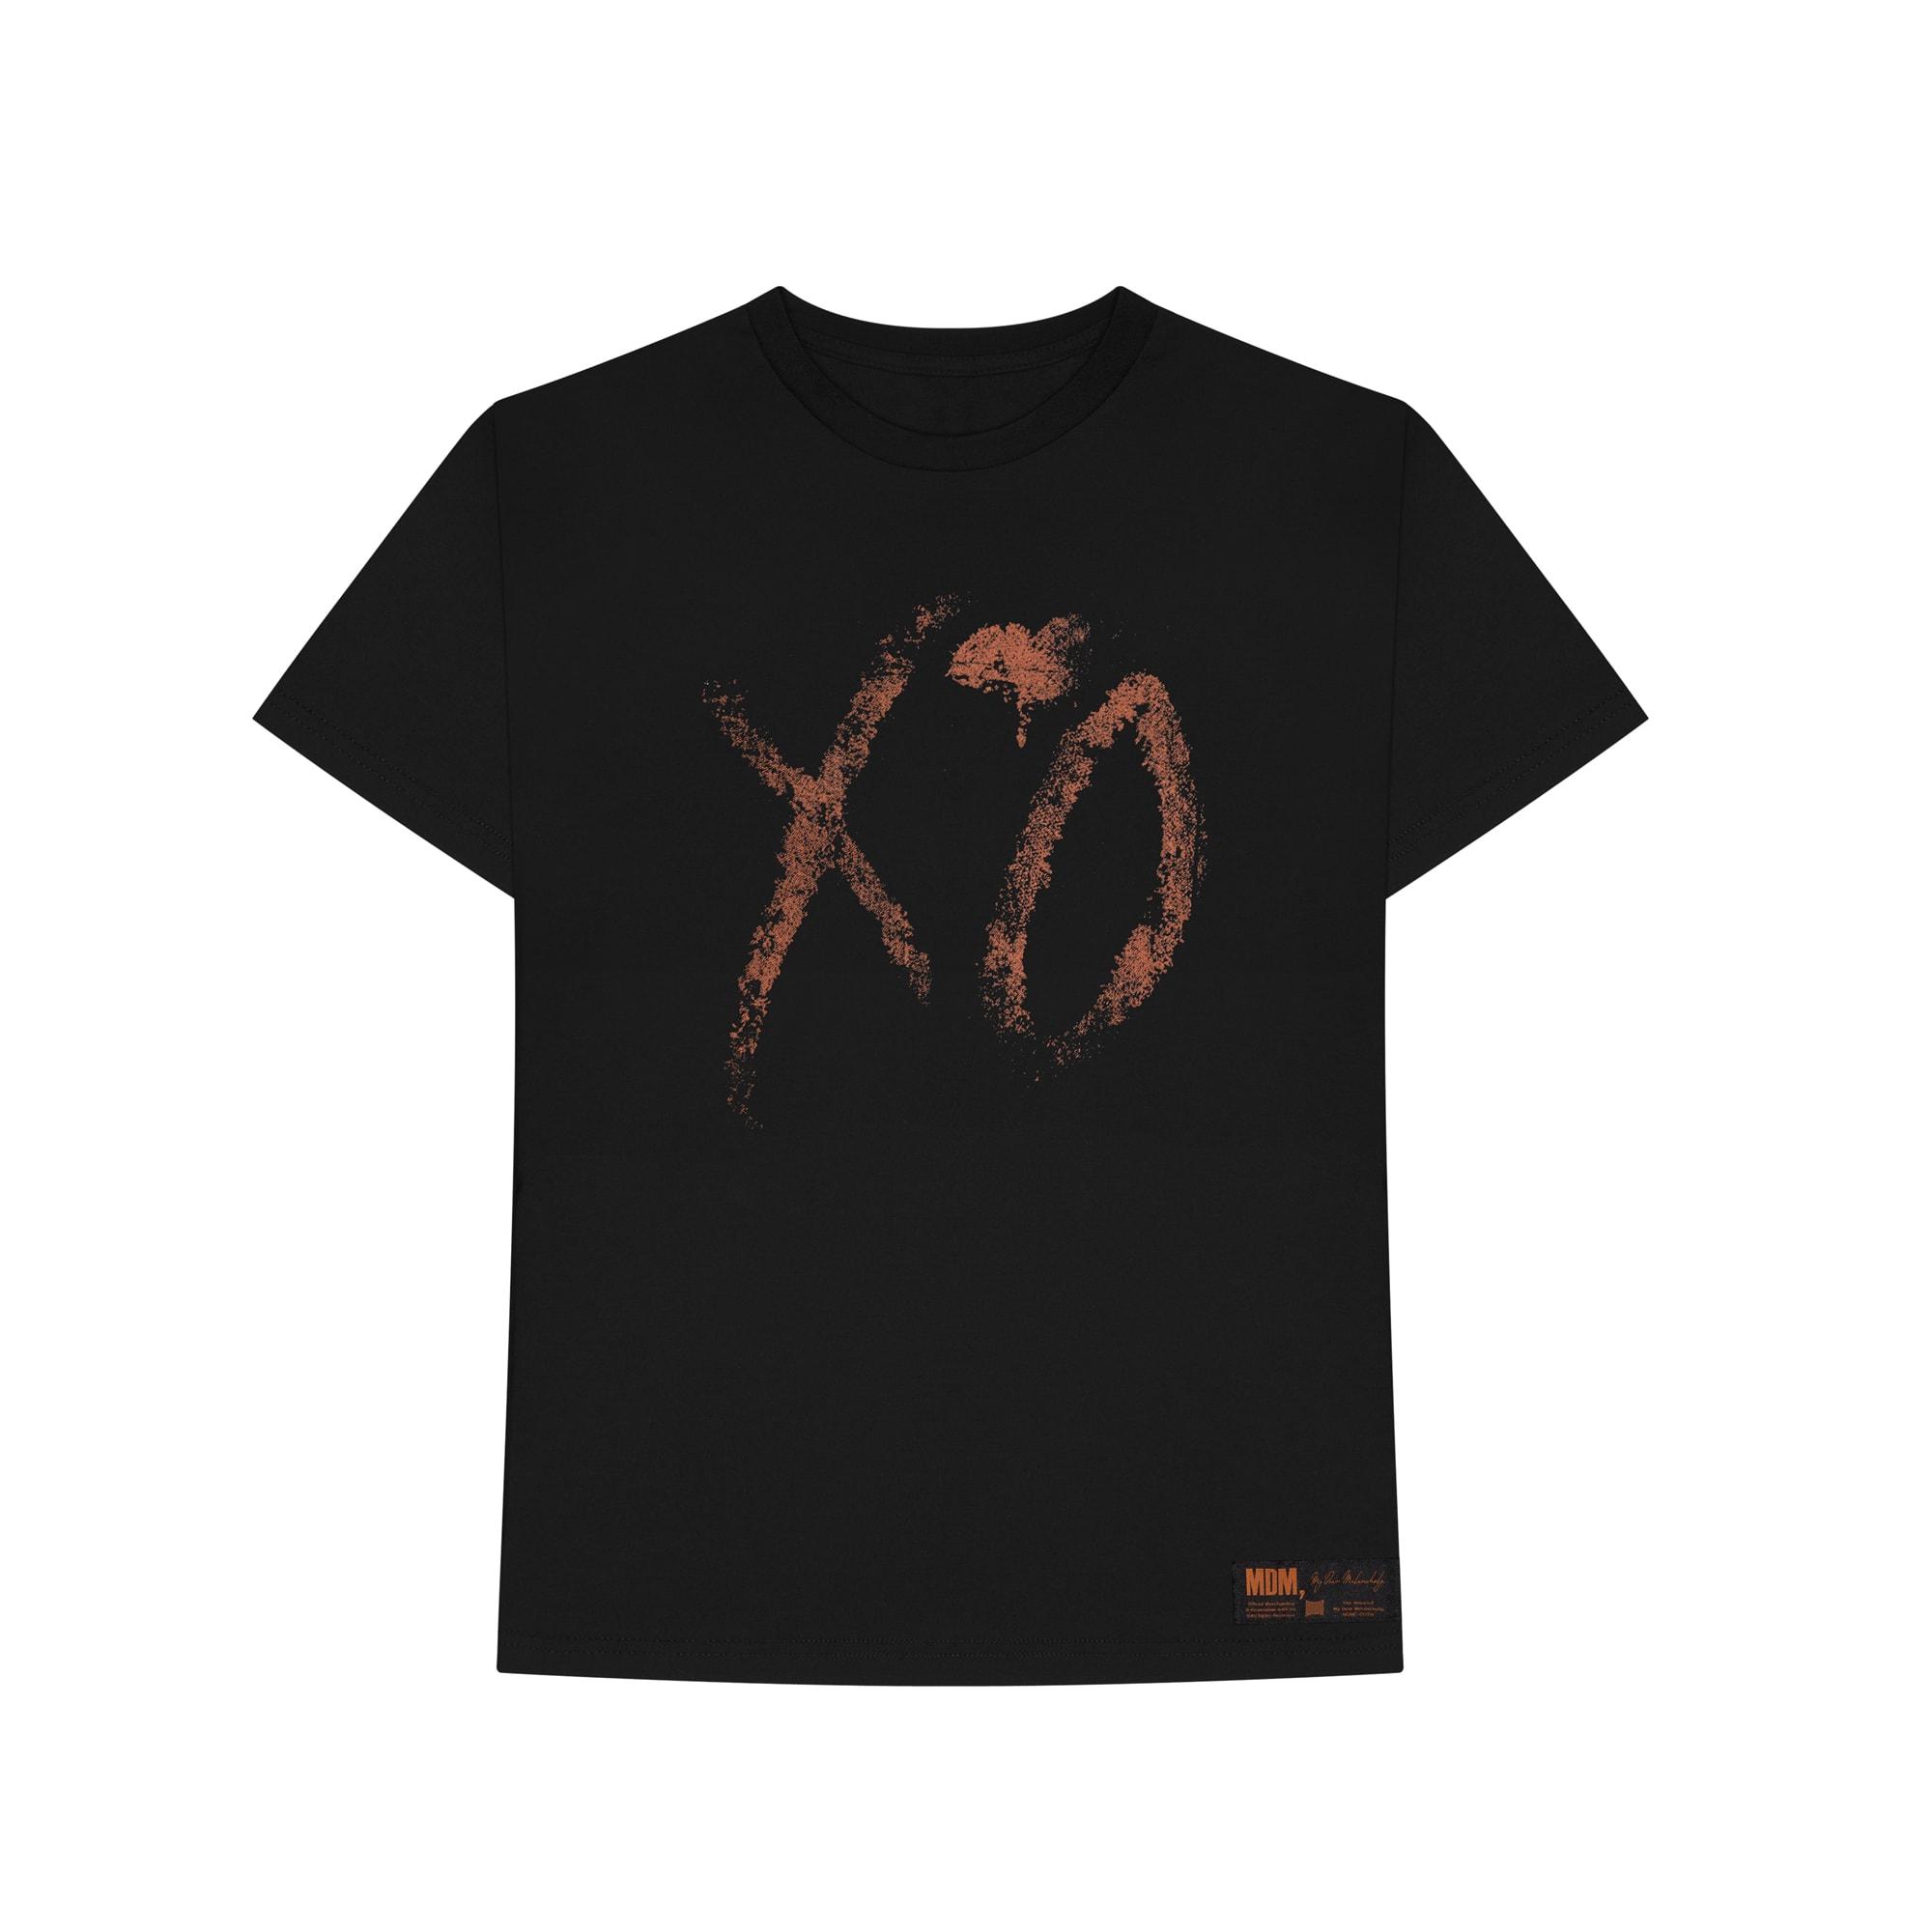 The Weeknd's 'My Dear Melancholy' logo t-shirt.